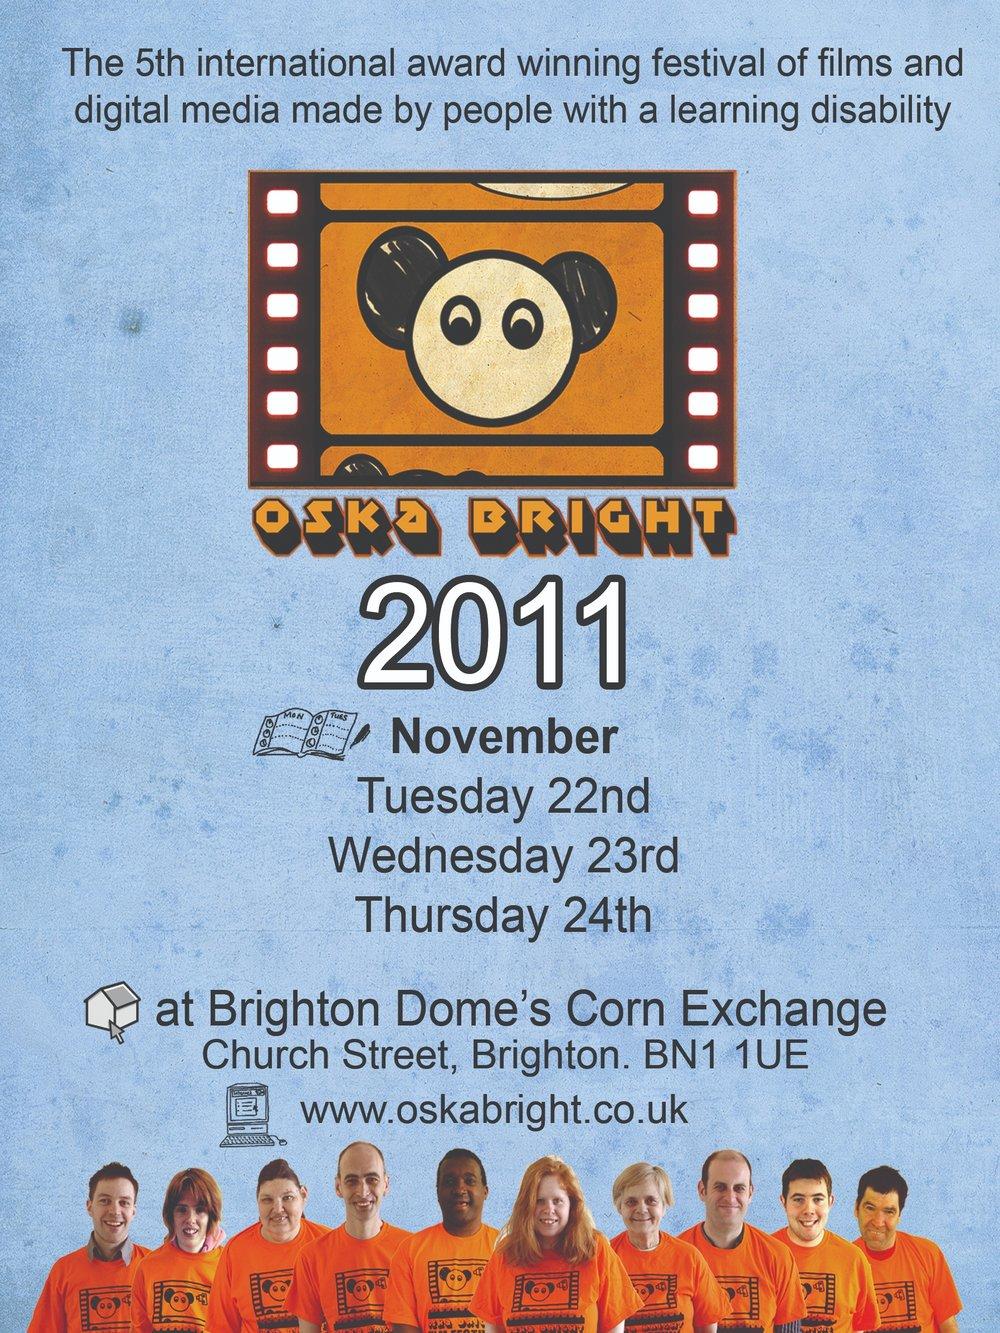 Oska Bright Film Festival 2011 Programme -